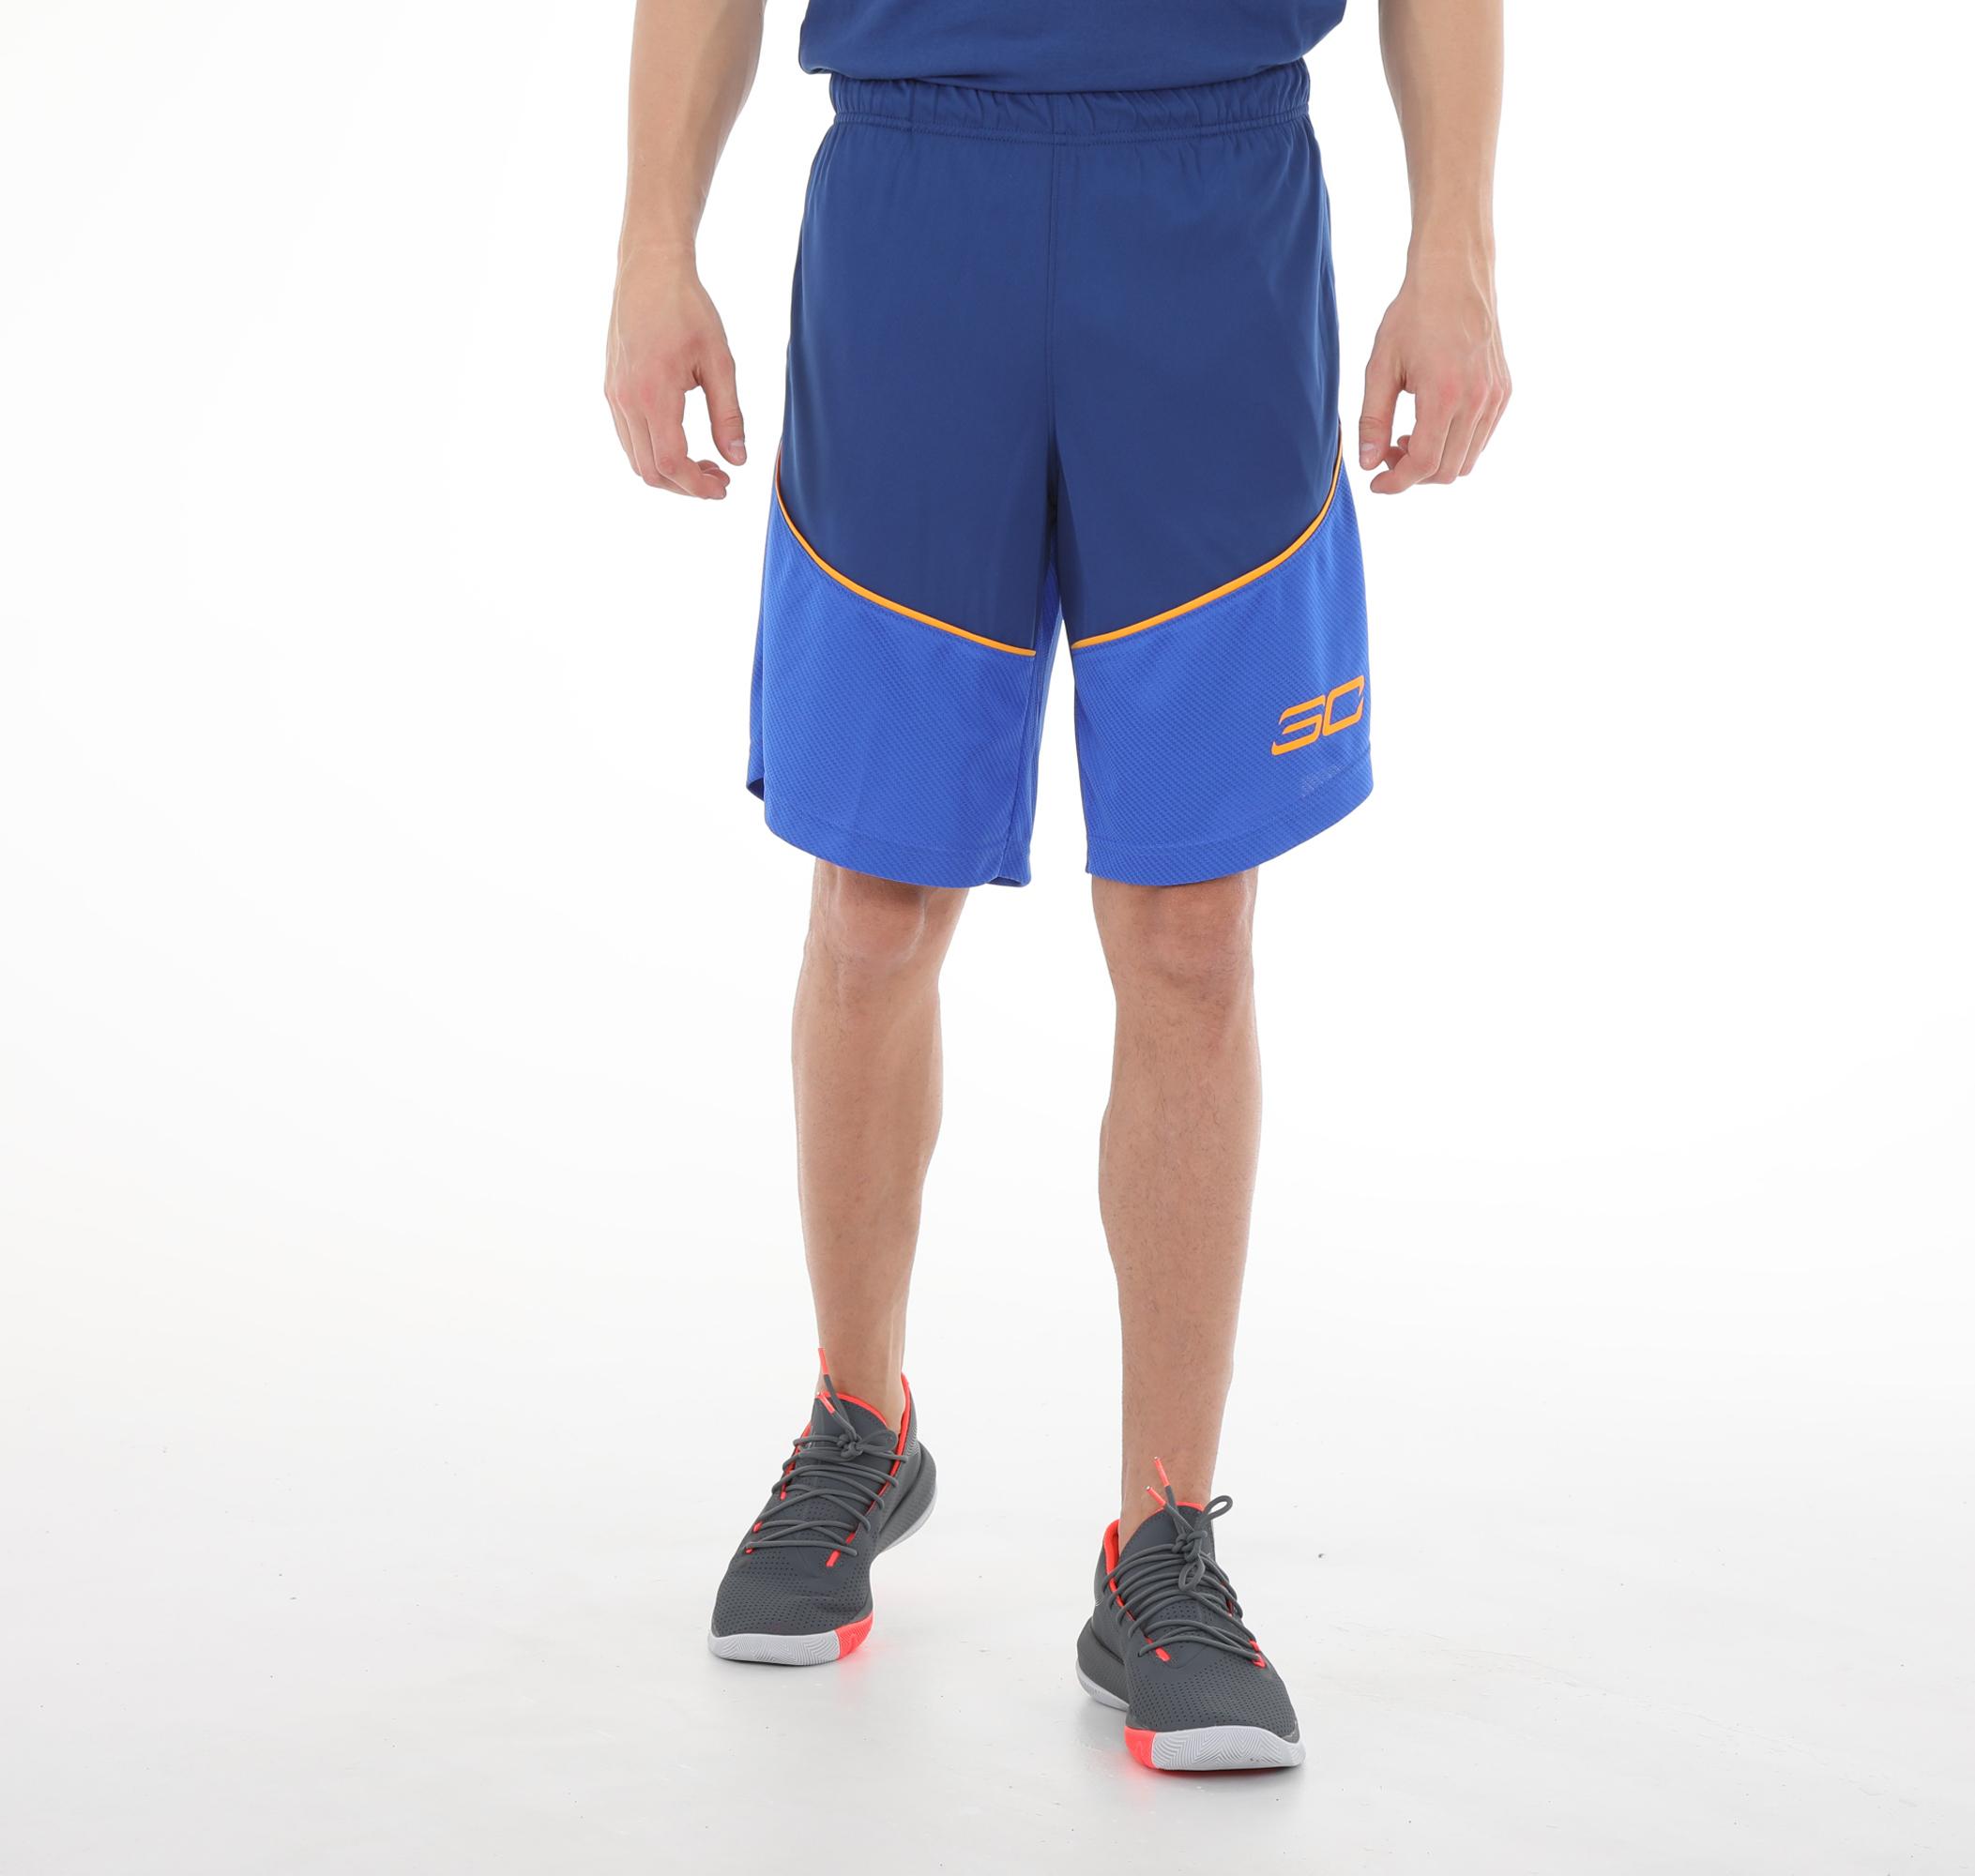 Sc30 10 In Short-Blu Erkek Şort Ve Kapri Lacivert